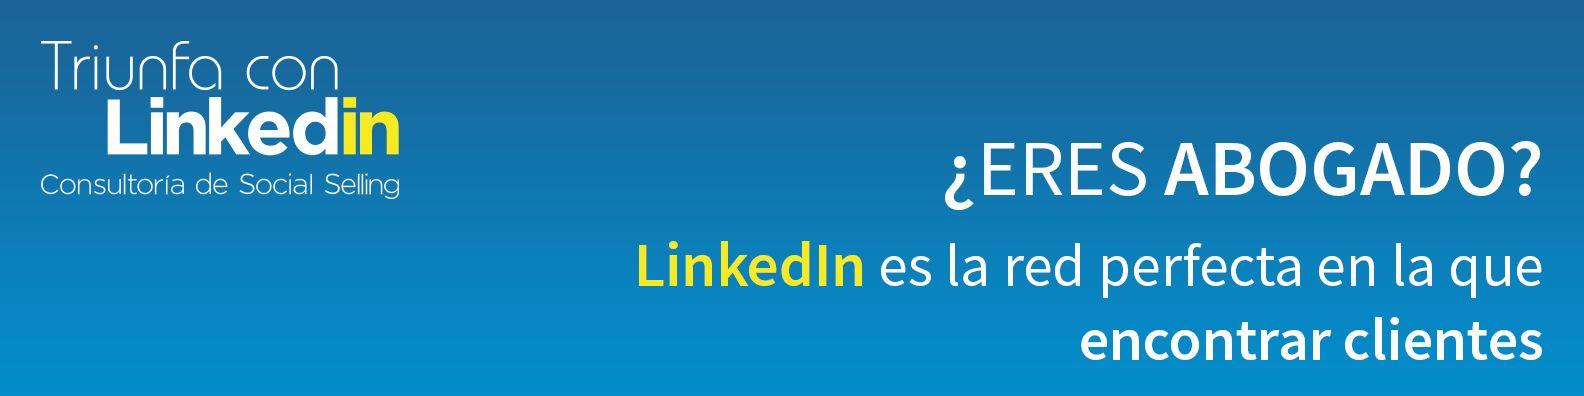 LinkedIn es la red perfecta para encontrar clientes si eres abogado